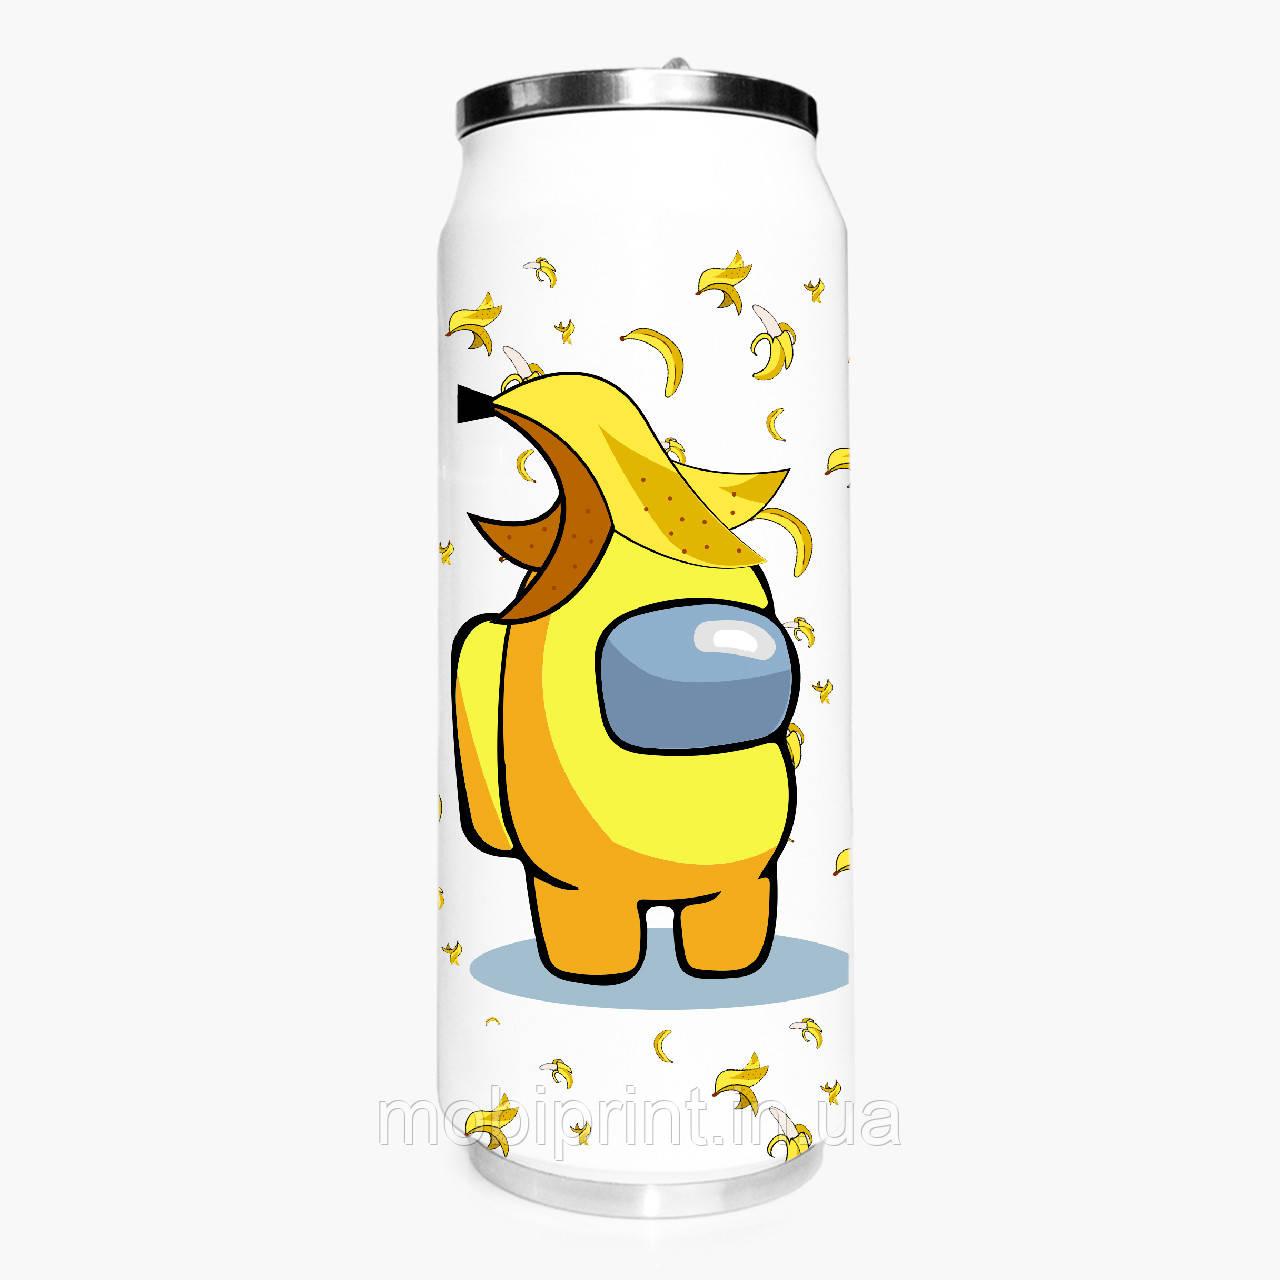 Термобанка Амонг Ас Желтый (Among Us Yellow) 500 мл (31091-2416-1) термокружка из нержавеющей стали